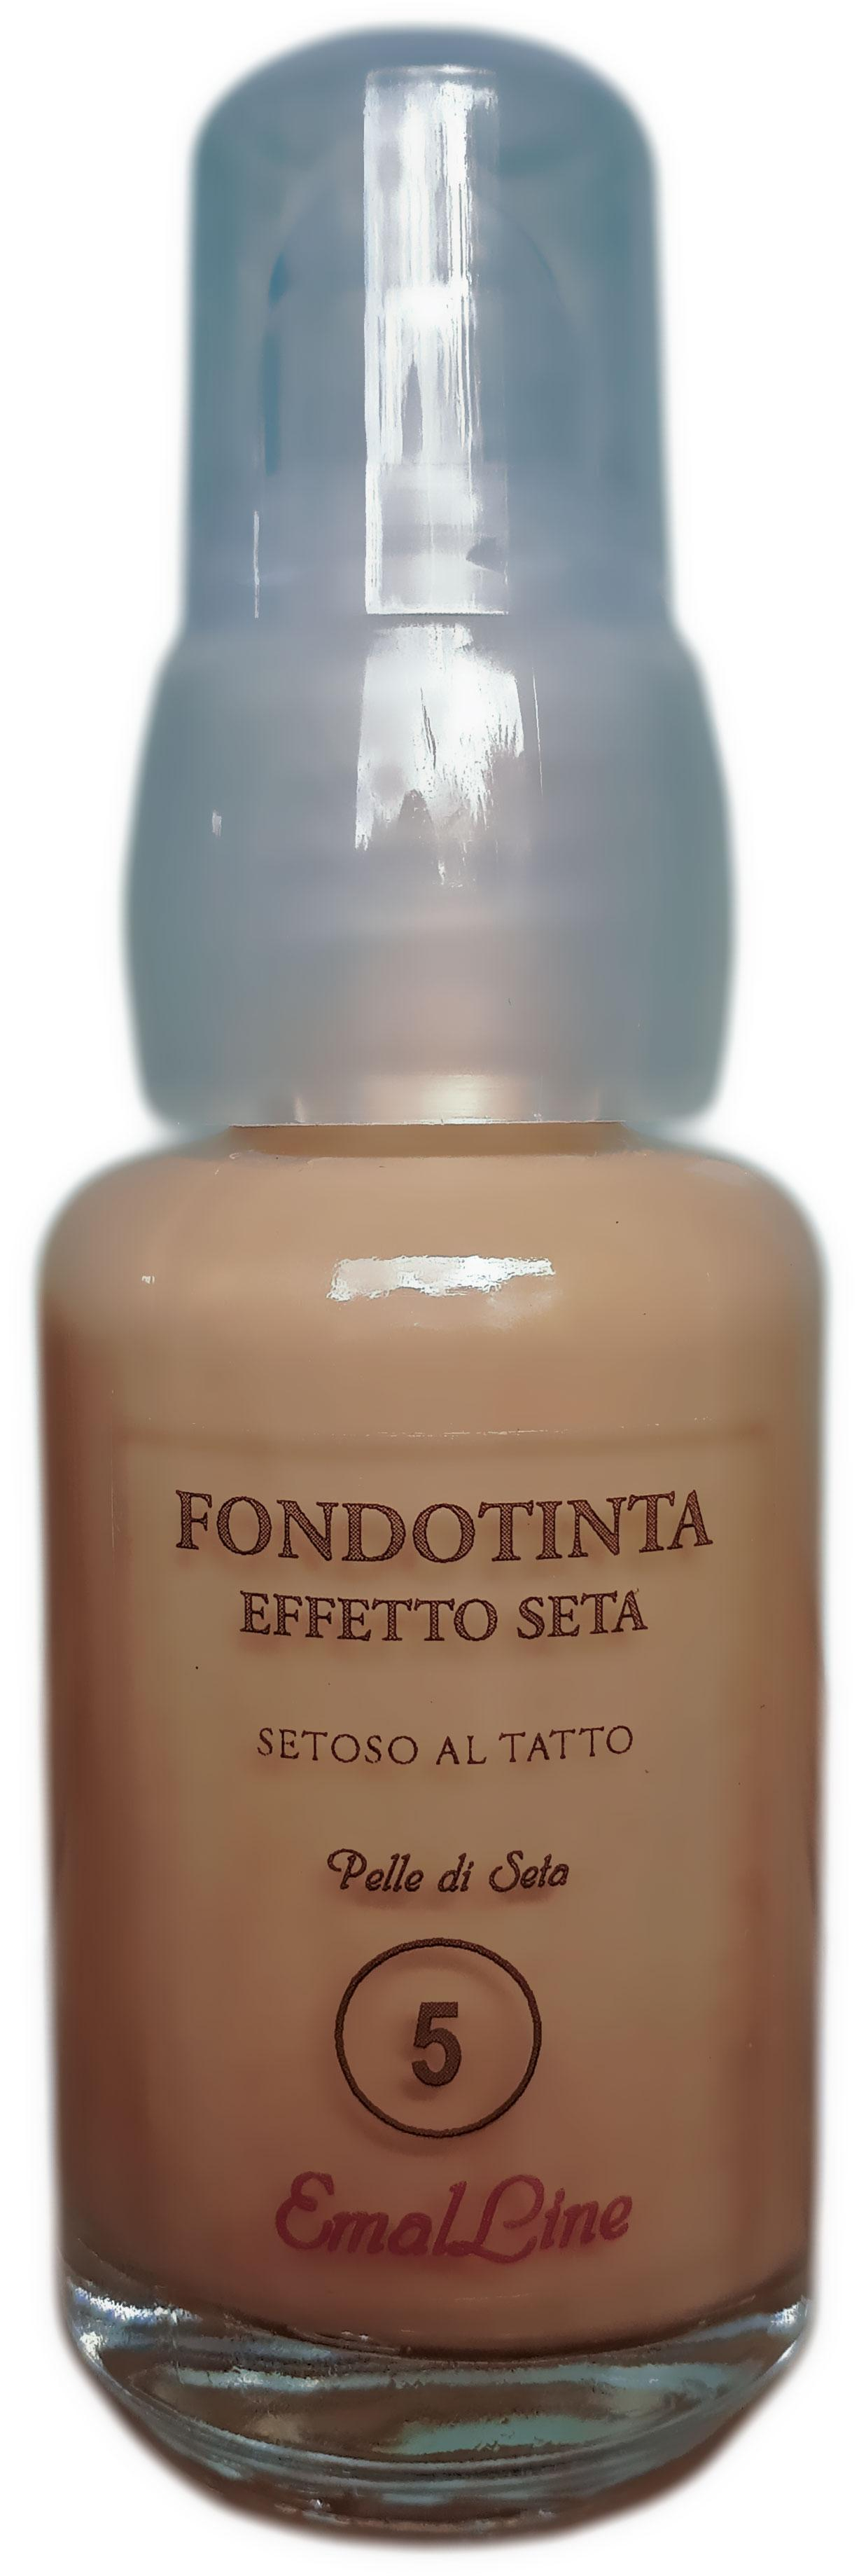 Fondotinta Fluido colore n.5  -  30 ml